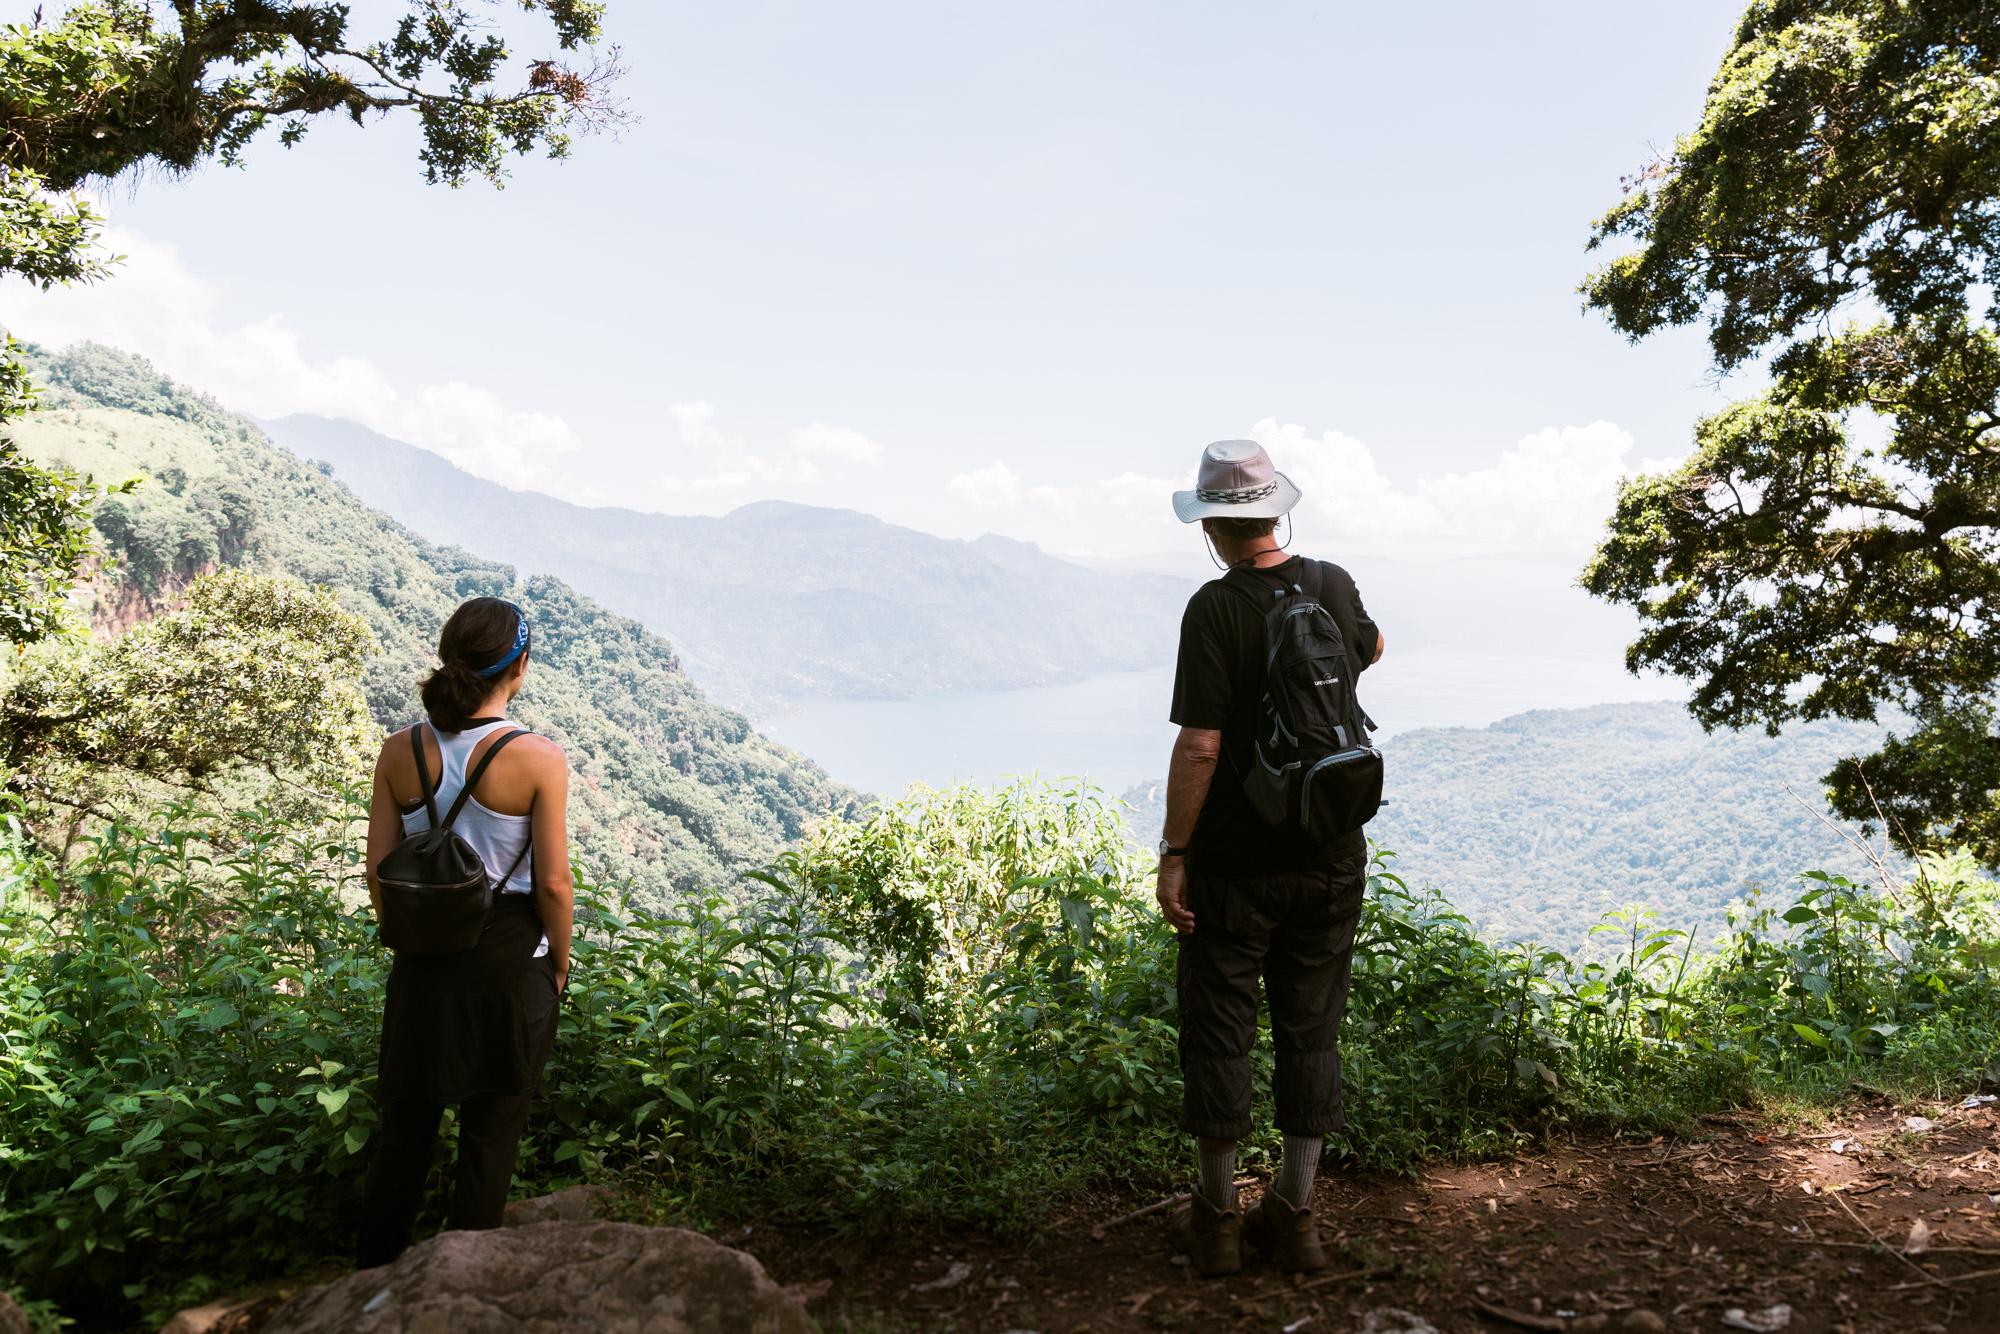 2 People hiking at lake Atitlan in Guatemala